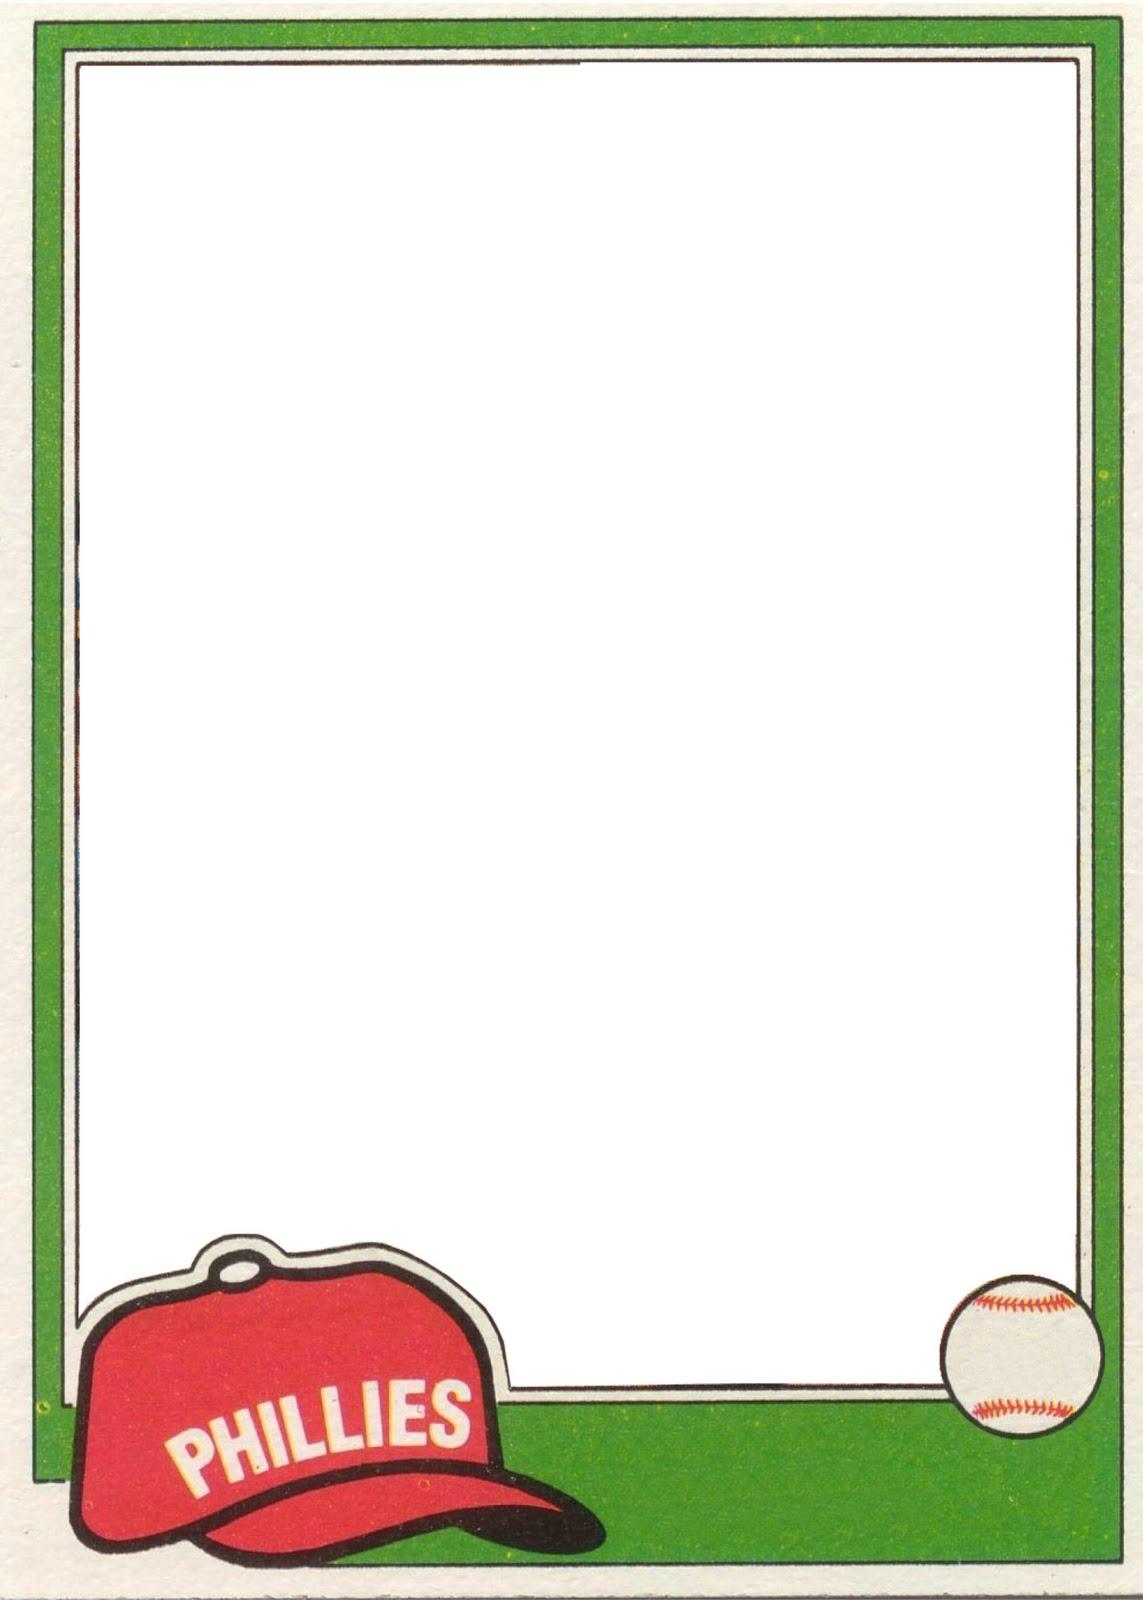 Free Baseball Card Cliparts, Download Free Clip Art, Free Clip Art.